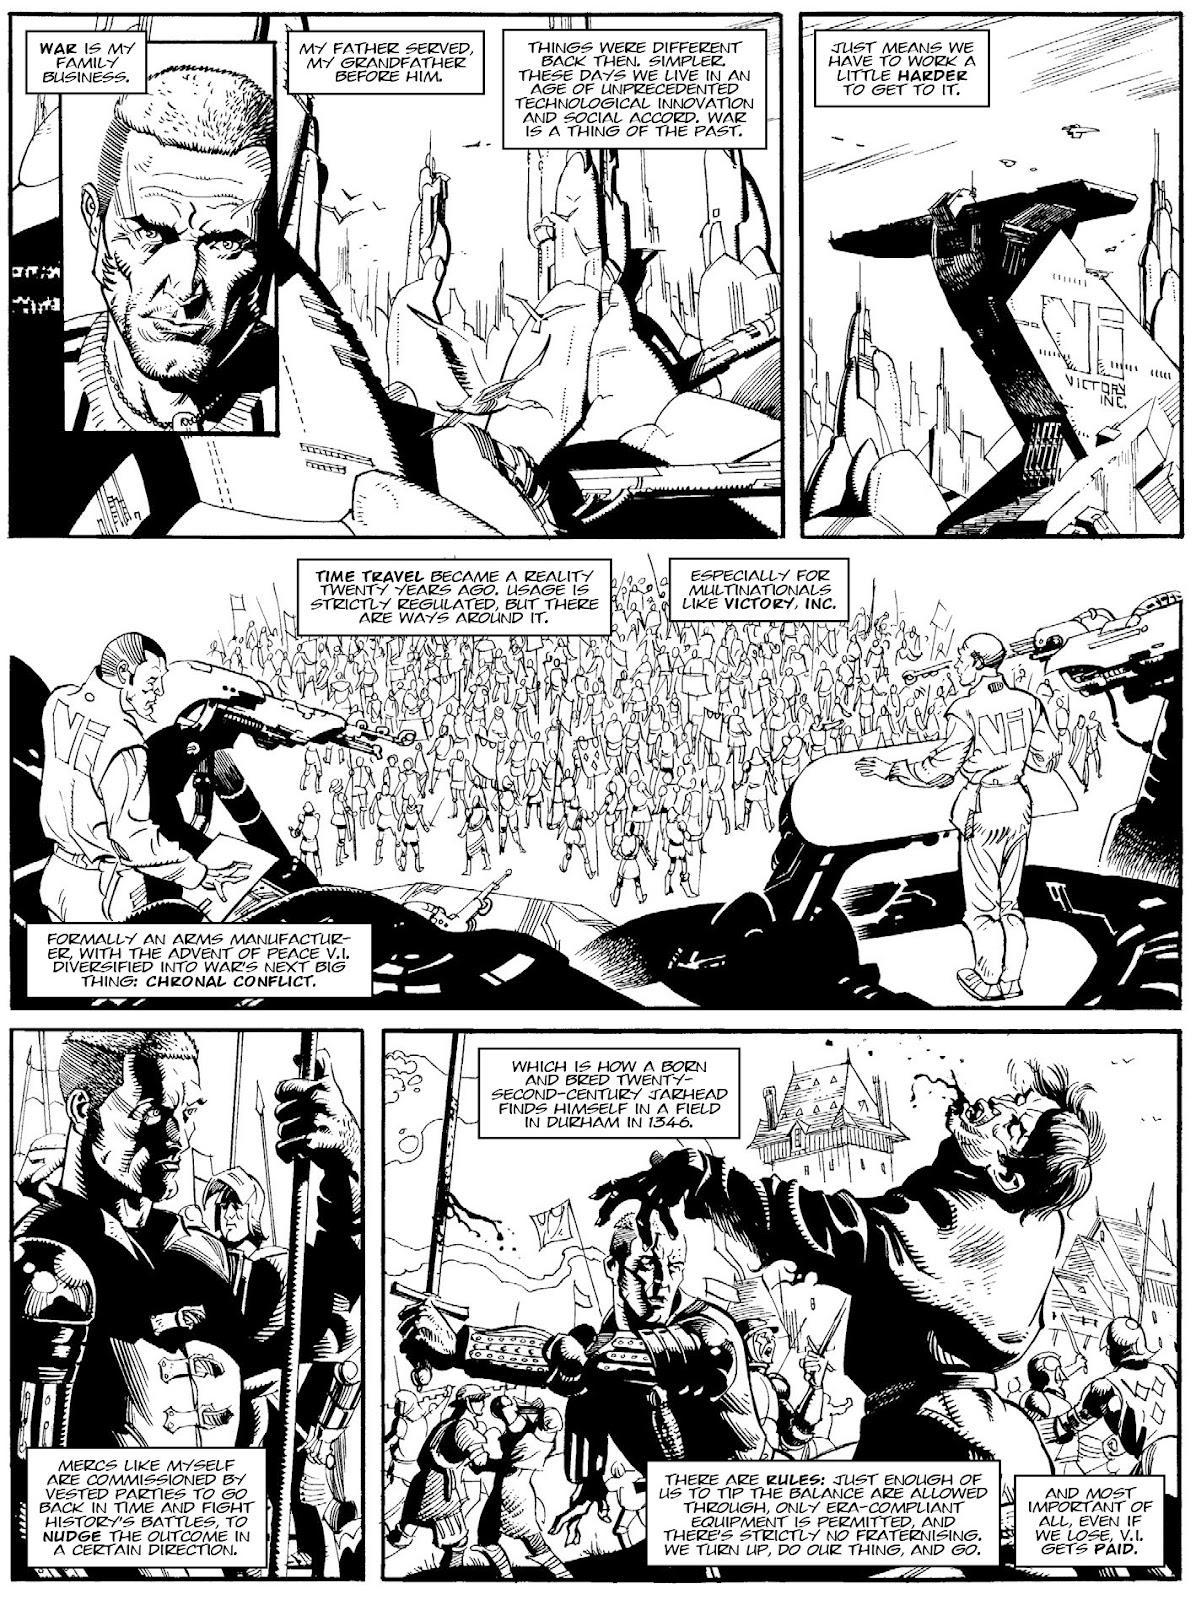 Judge Dredd Megazine (Vol. 5) issue 427 - Page 110